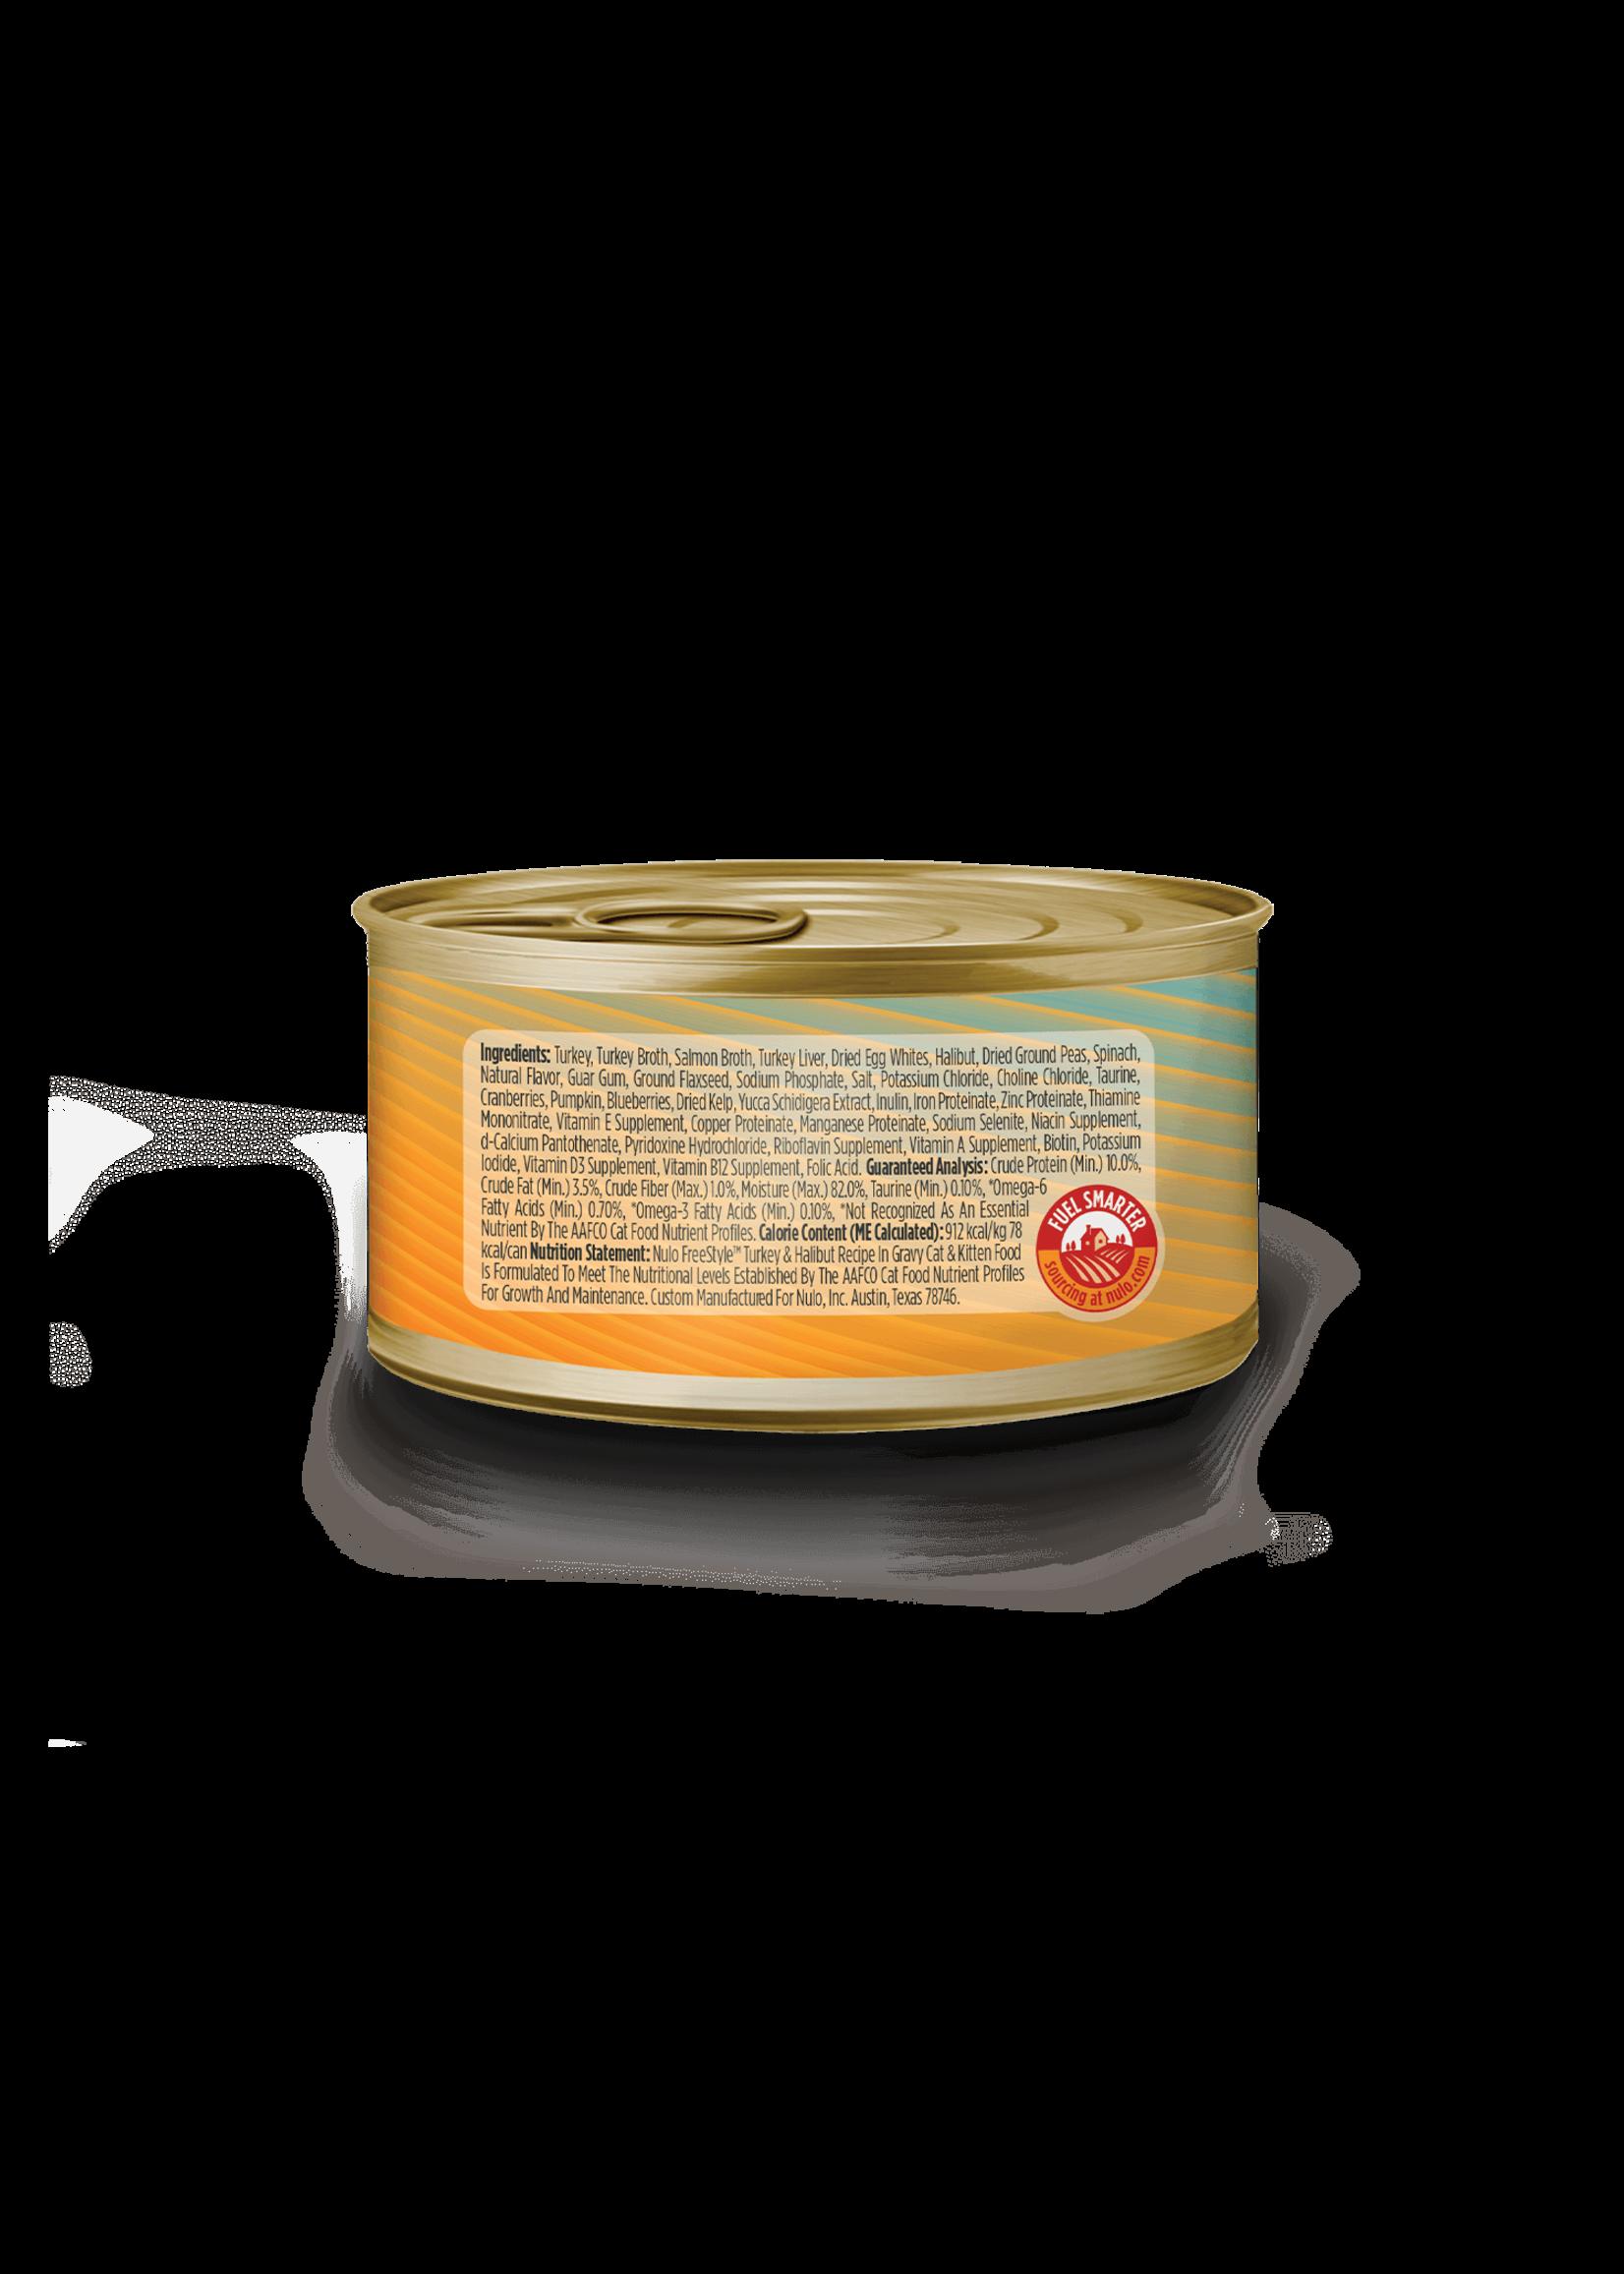 Nulo Nulo FreeStyle Grain Free Cat Food Shredded Turkey & Halibut in Gravy, 3oz Can